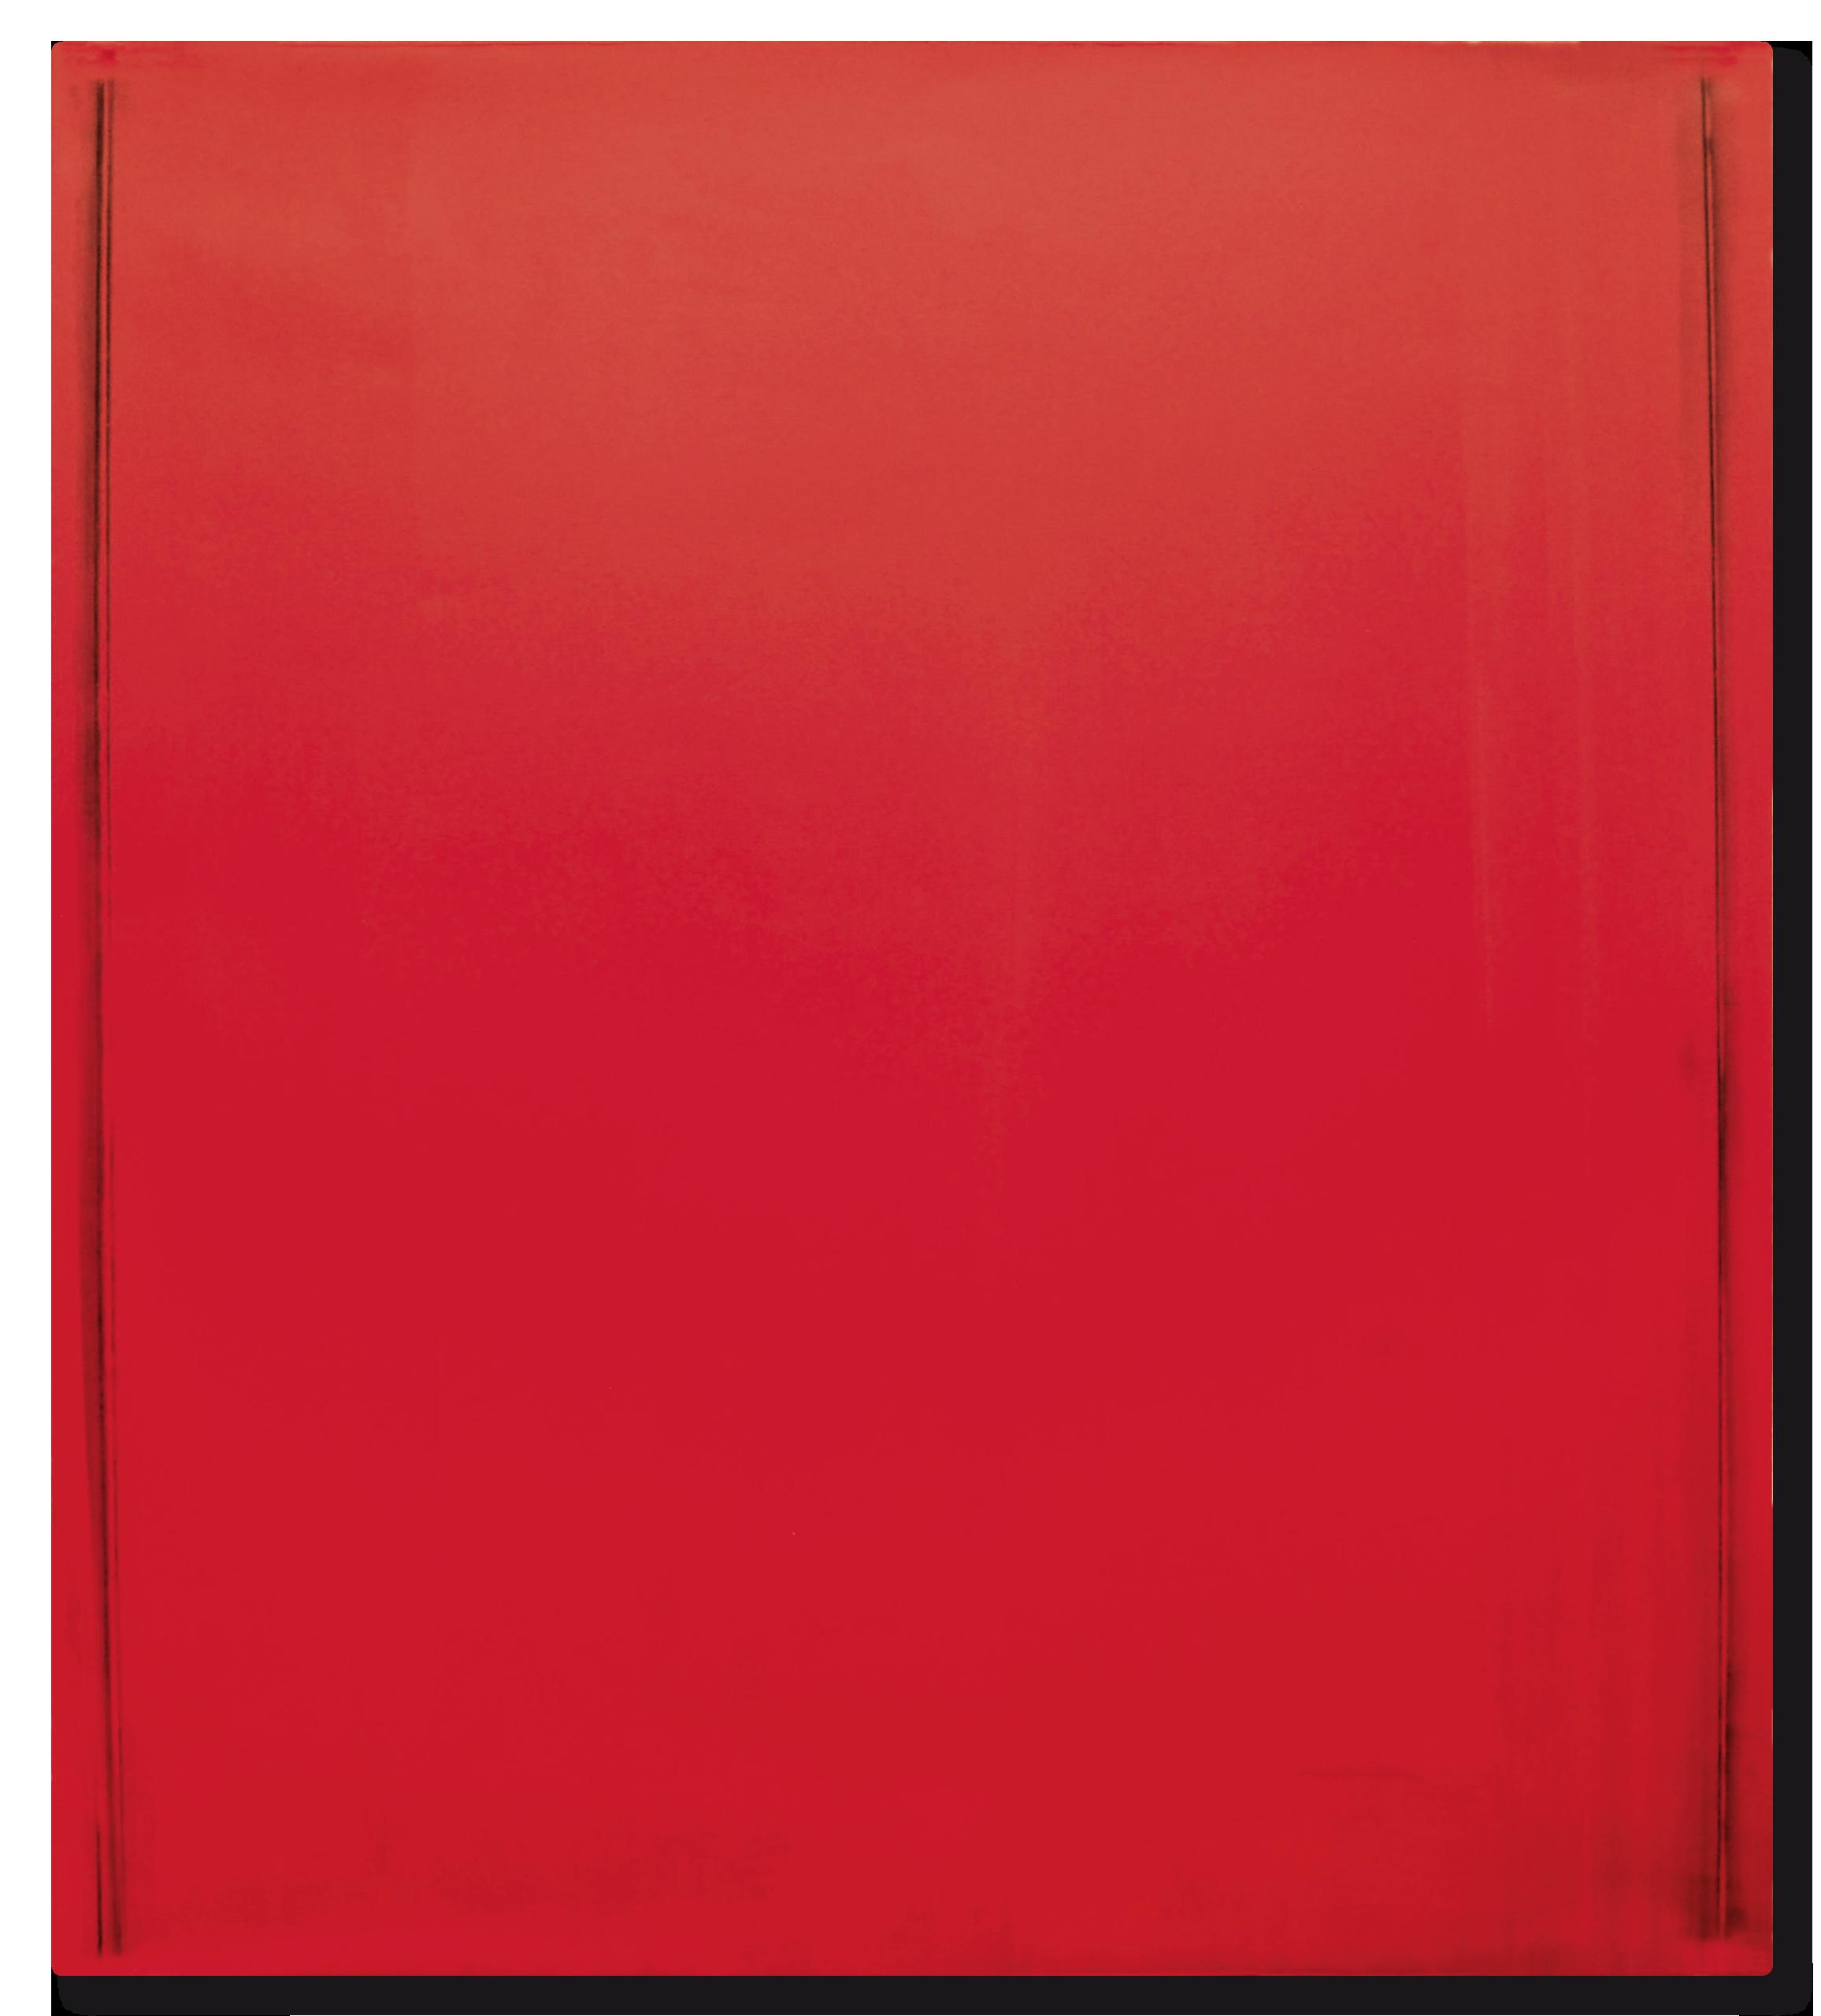 DOORA_AF 2006-23.png